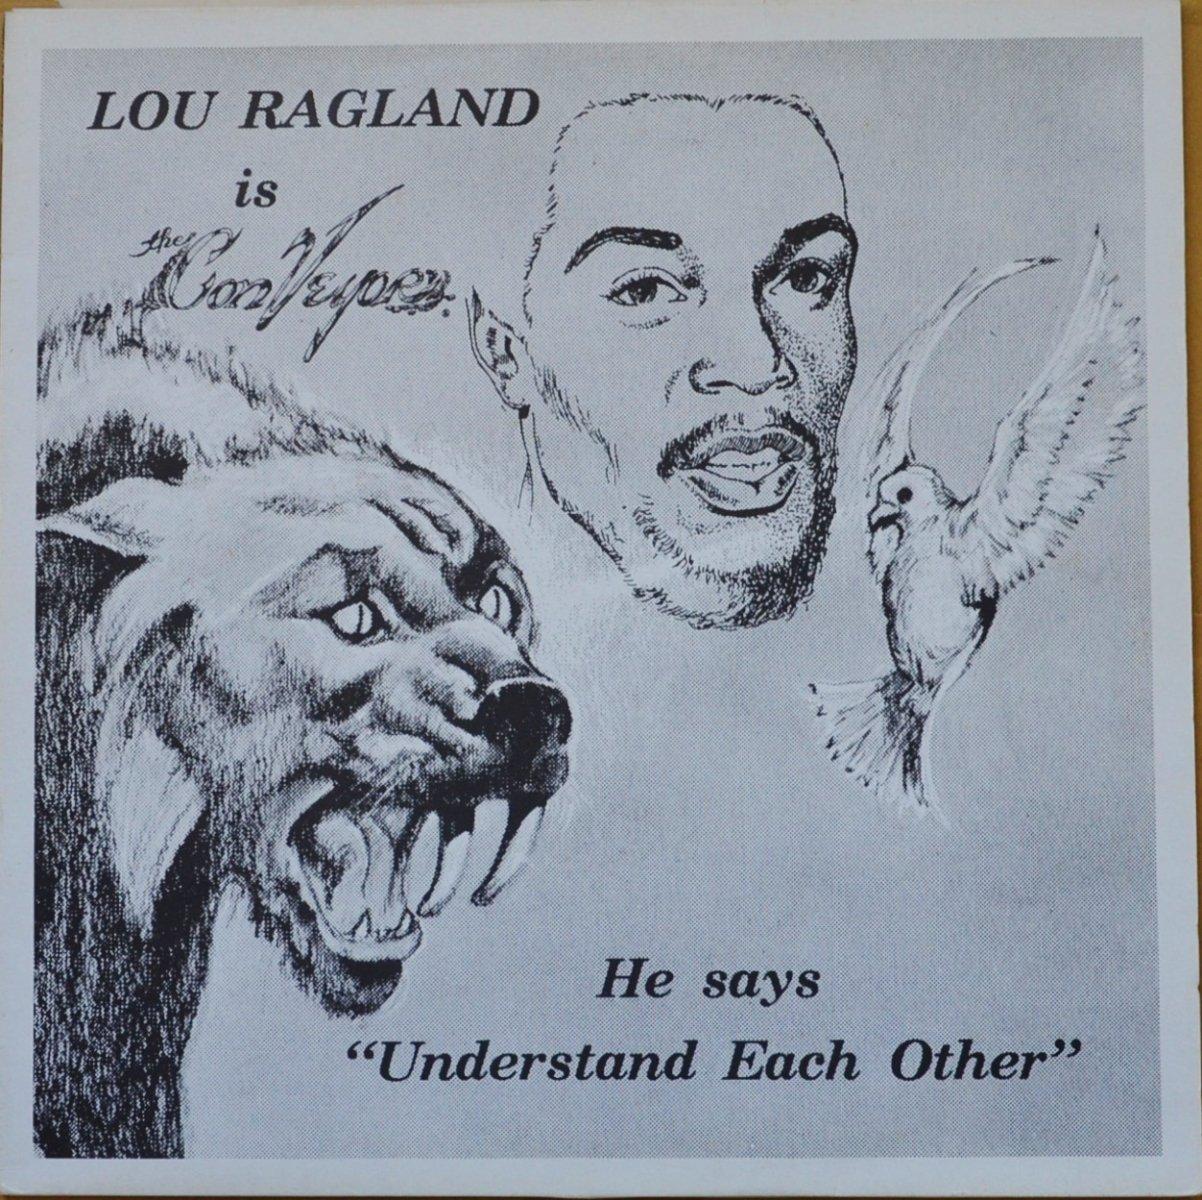 LOU RAGLAND / IS THE CONVEYOR